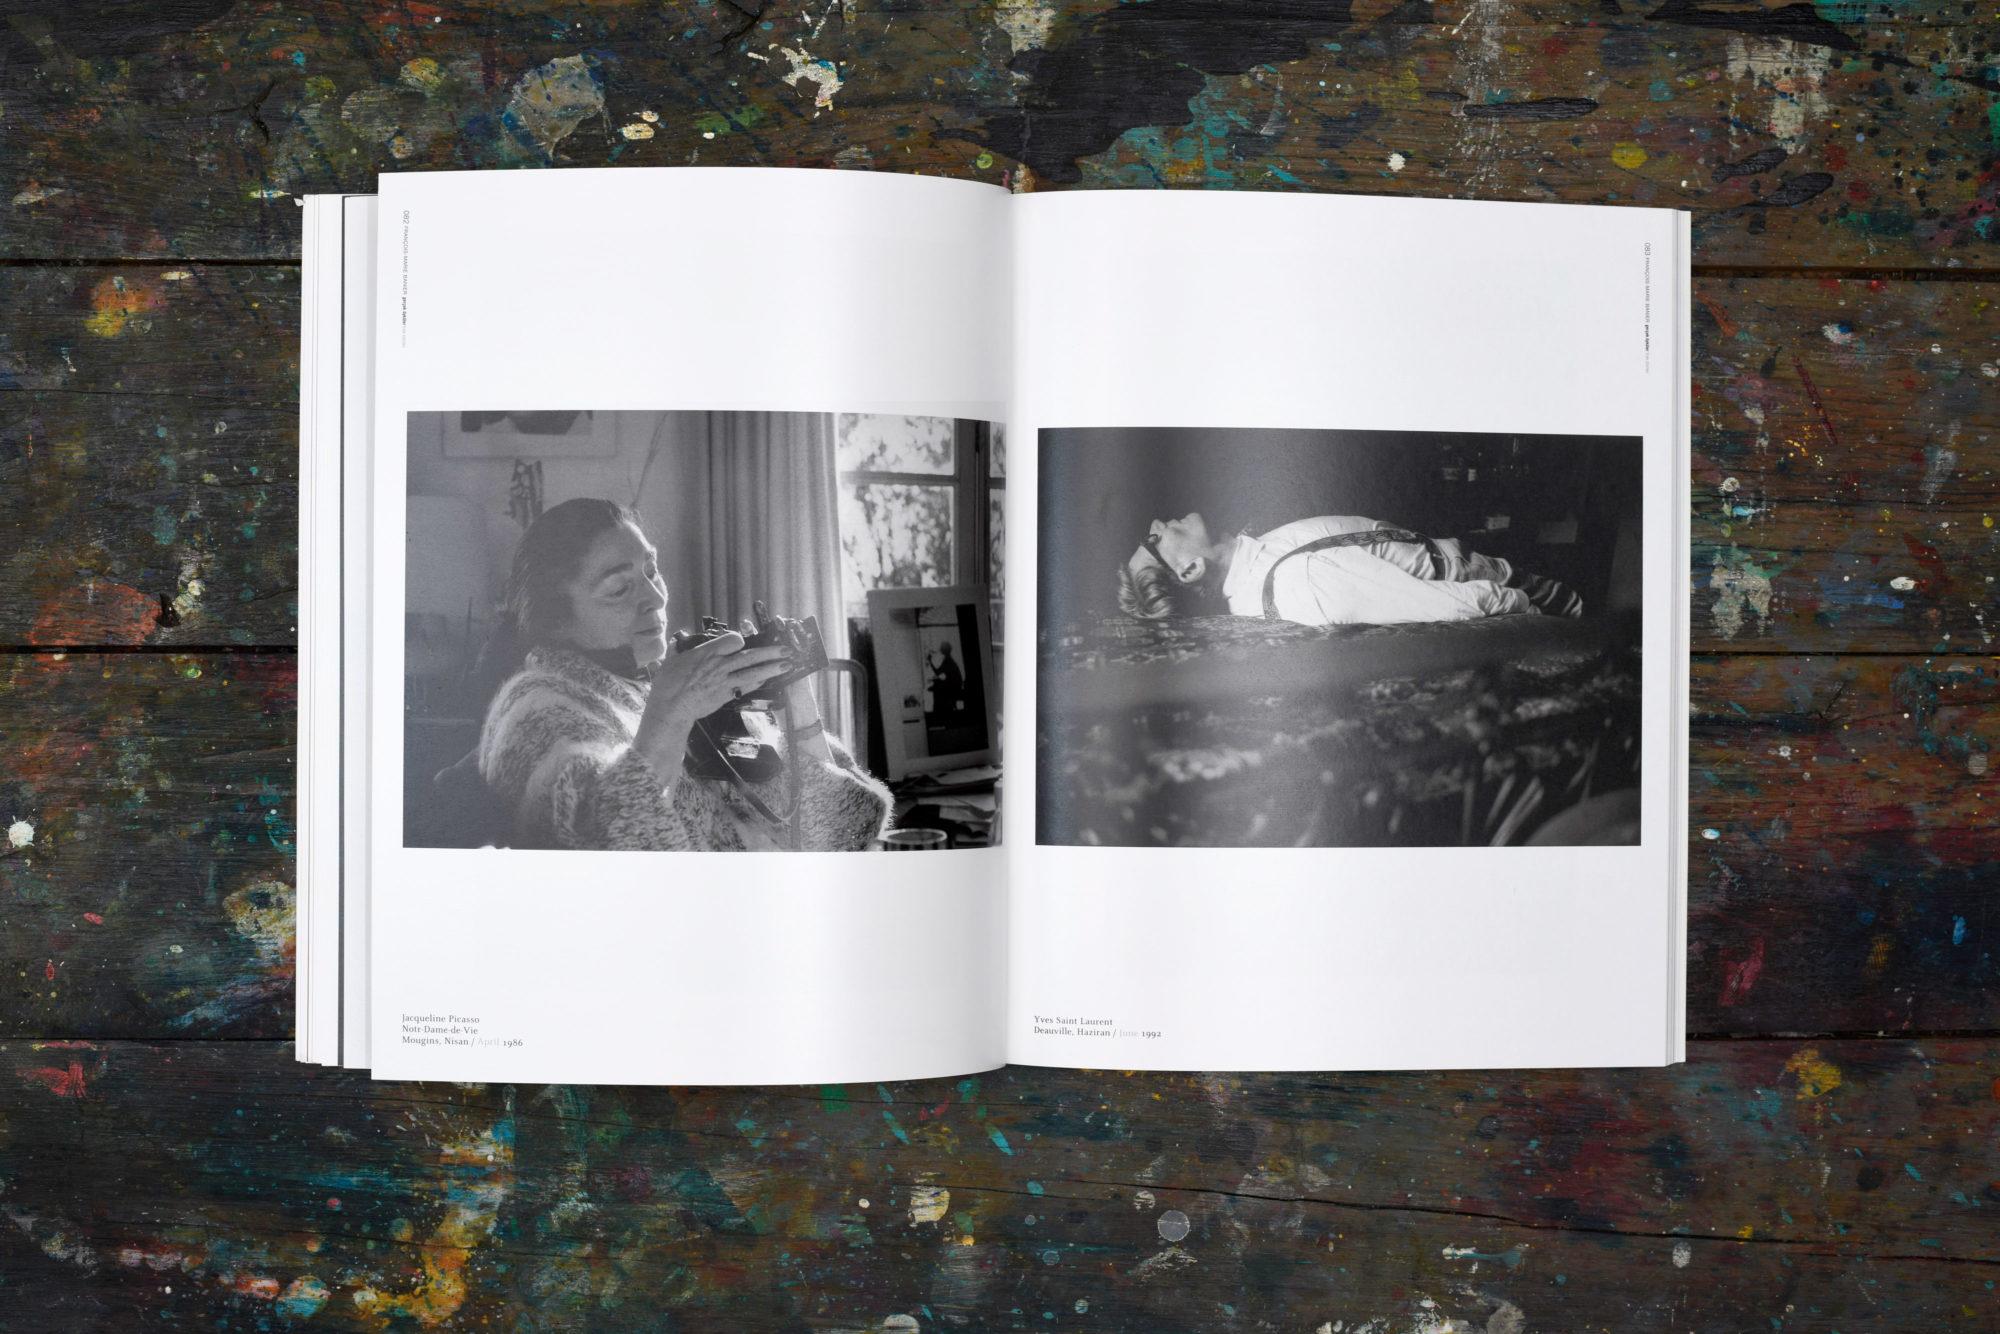 True Stories - François-Marie Banier